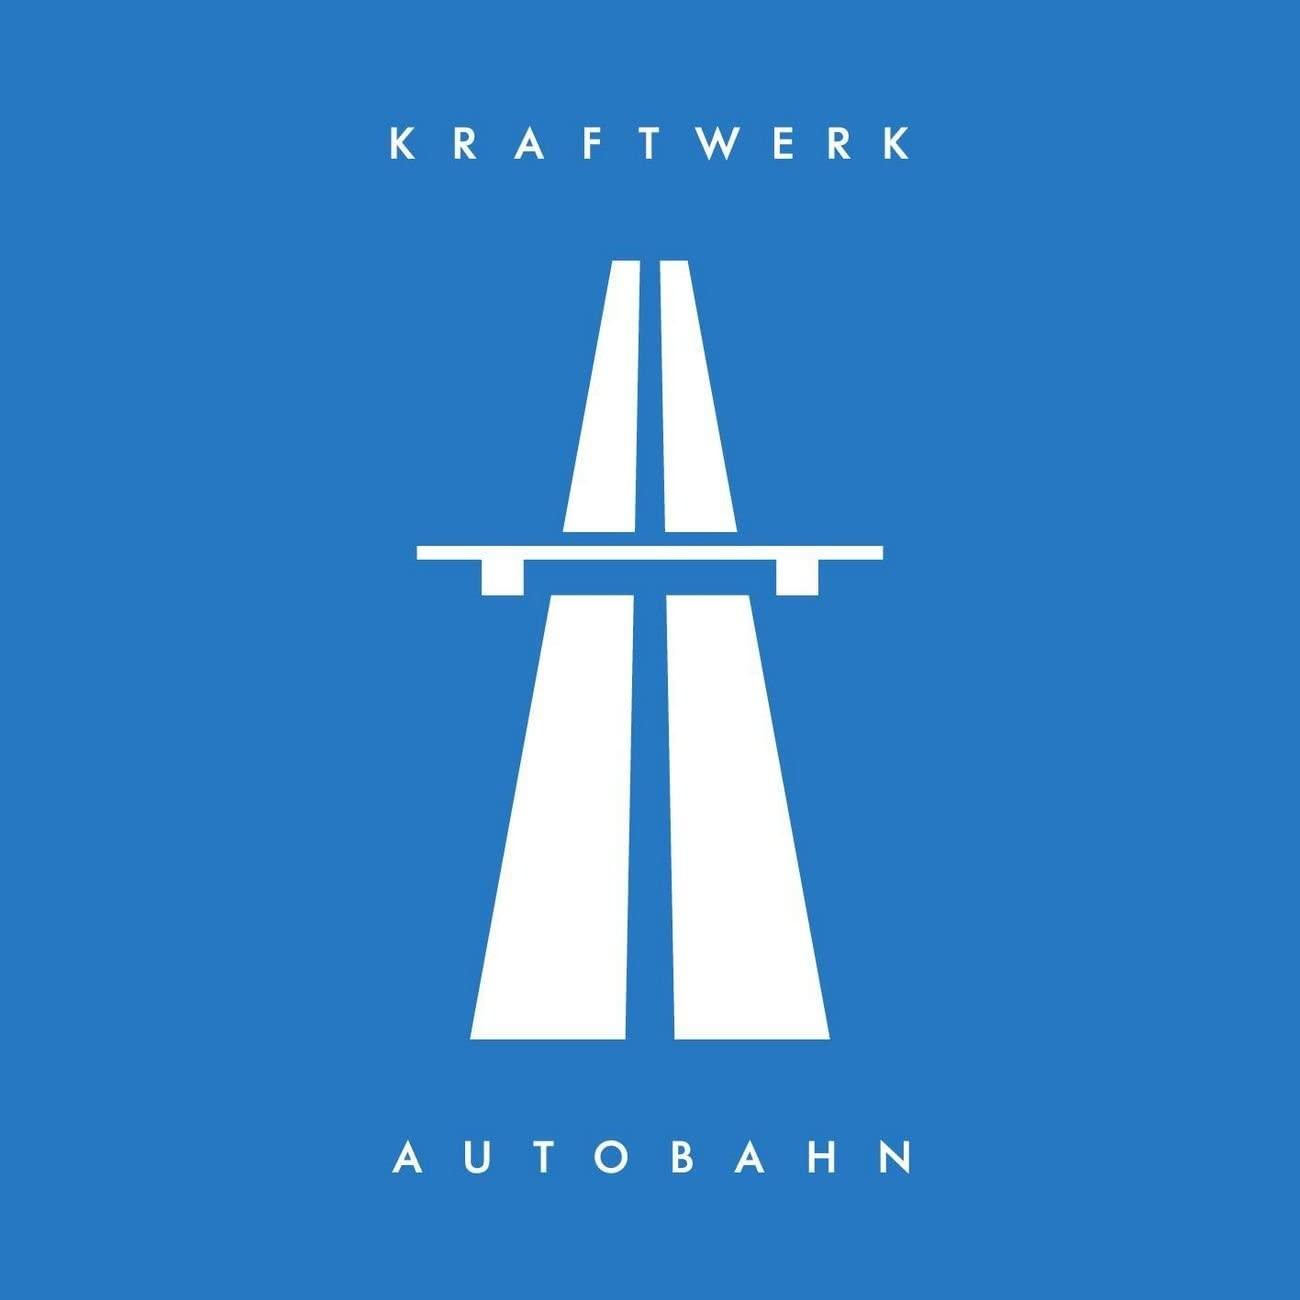 Copertina Vinile 33 giri Autobahn di Kraftwerk